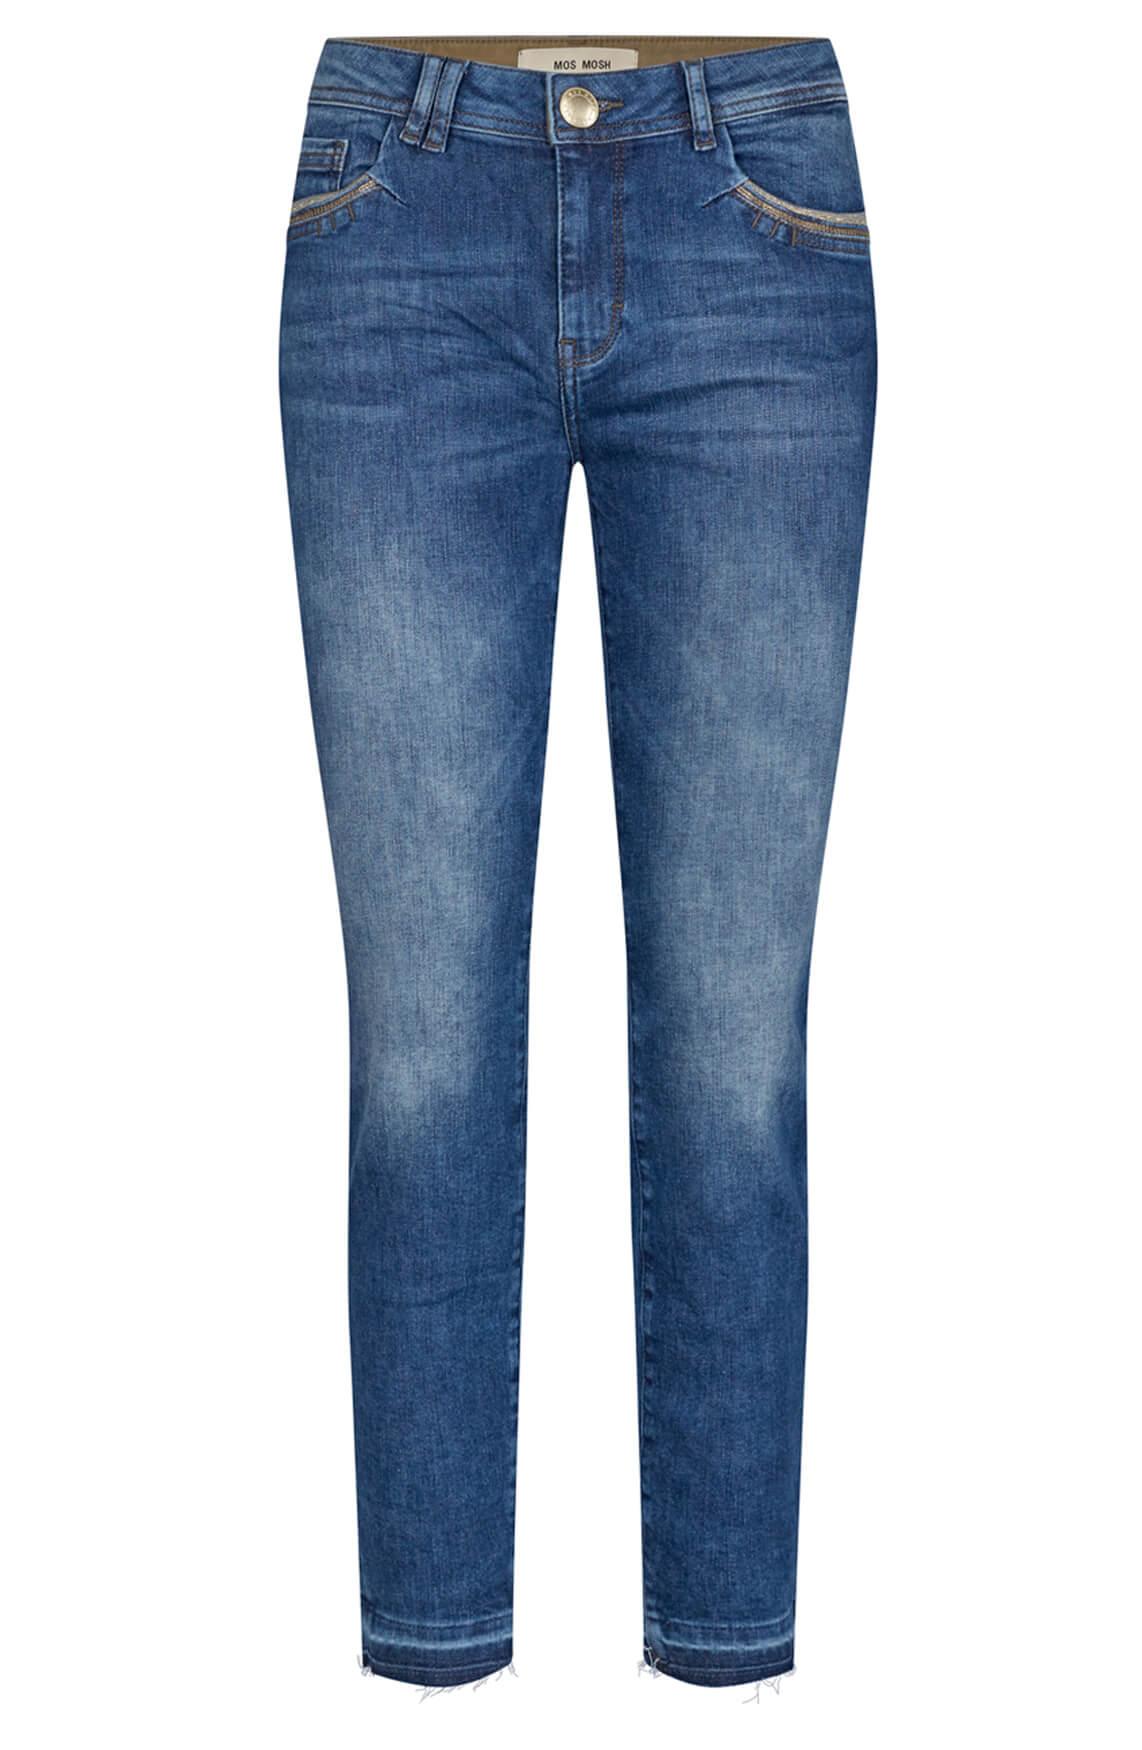 Mos Mosh Dames Sumner jeans Blauw